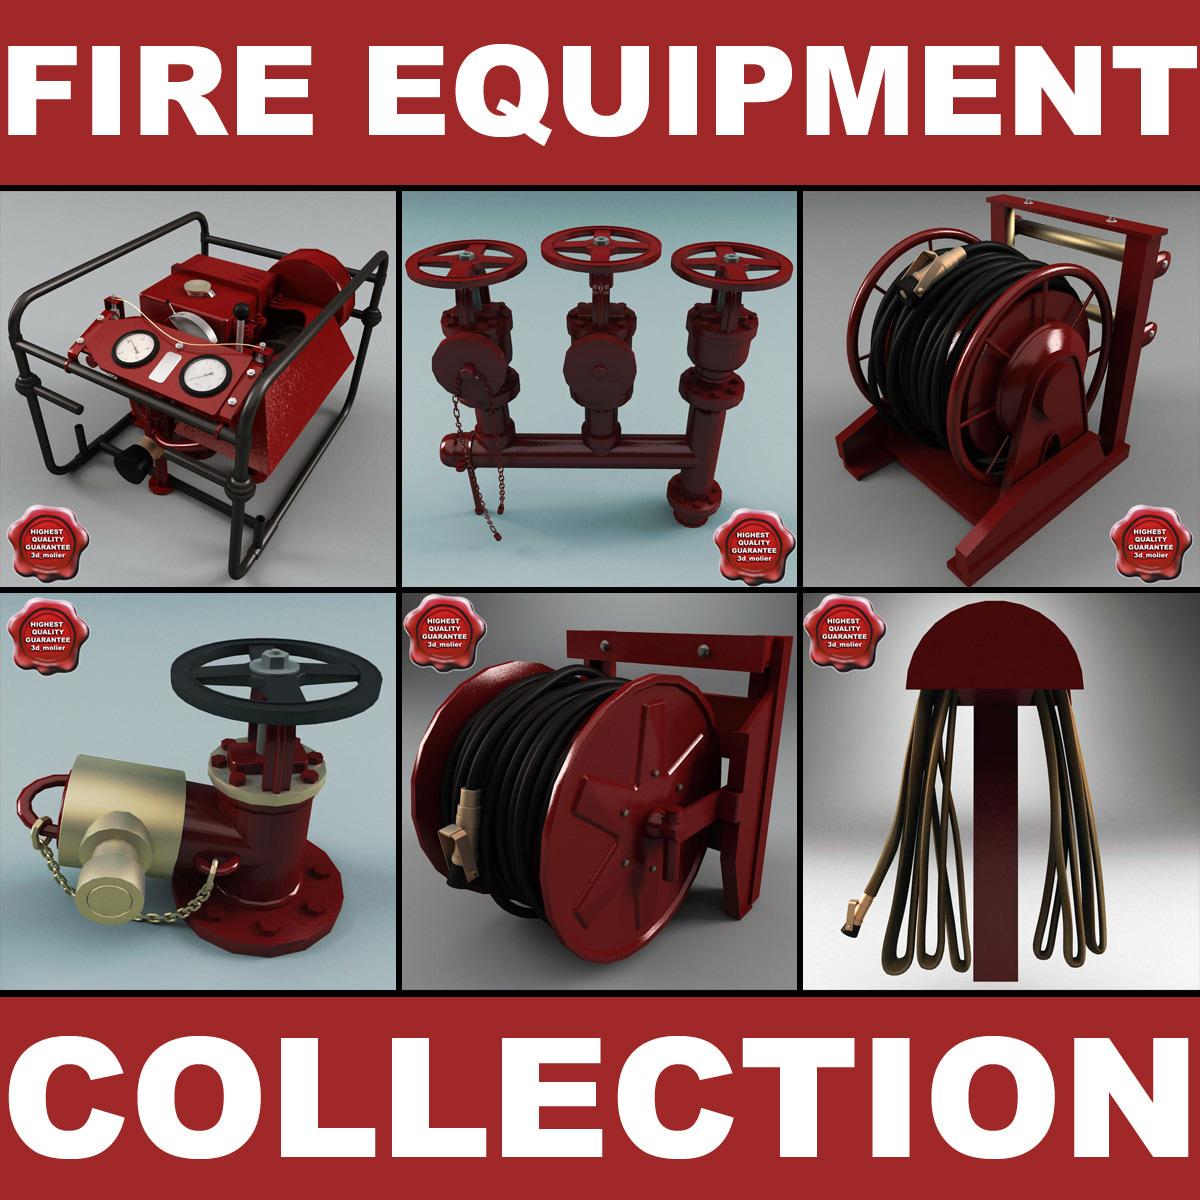 Ship_Fire_Equipment_Collection_V2_00.jpg